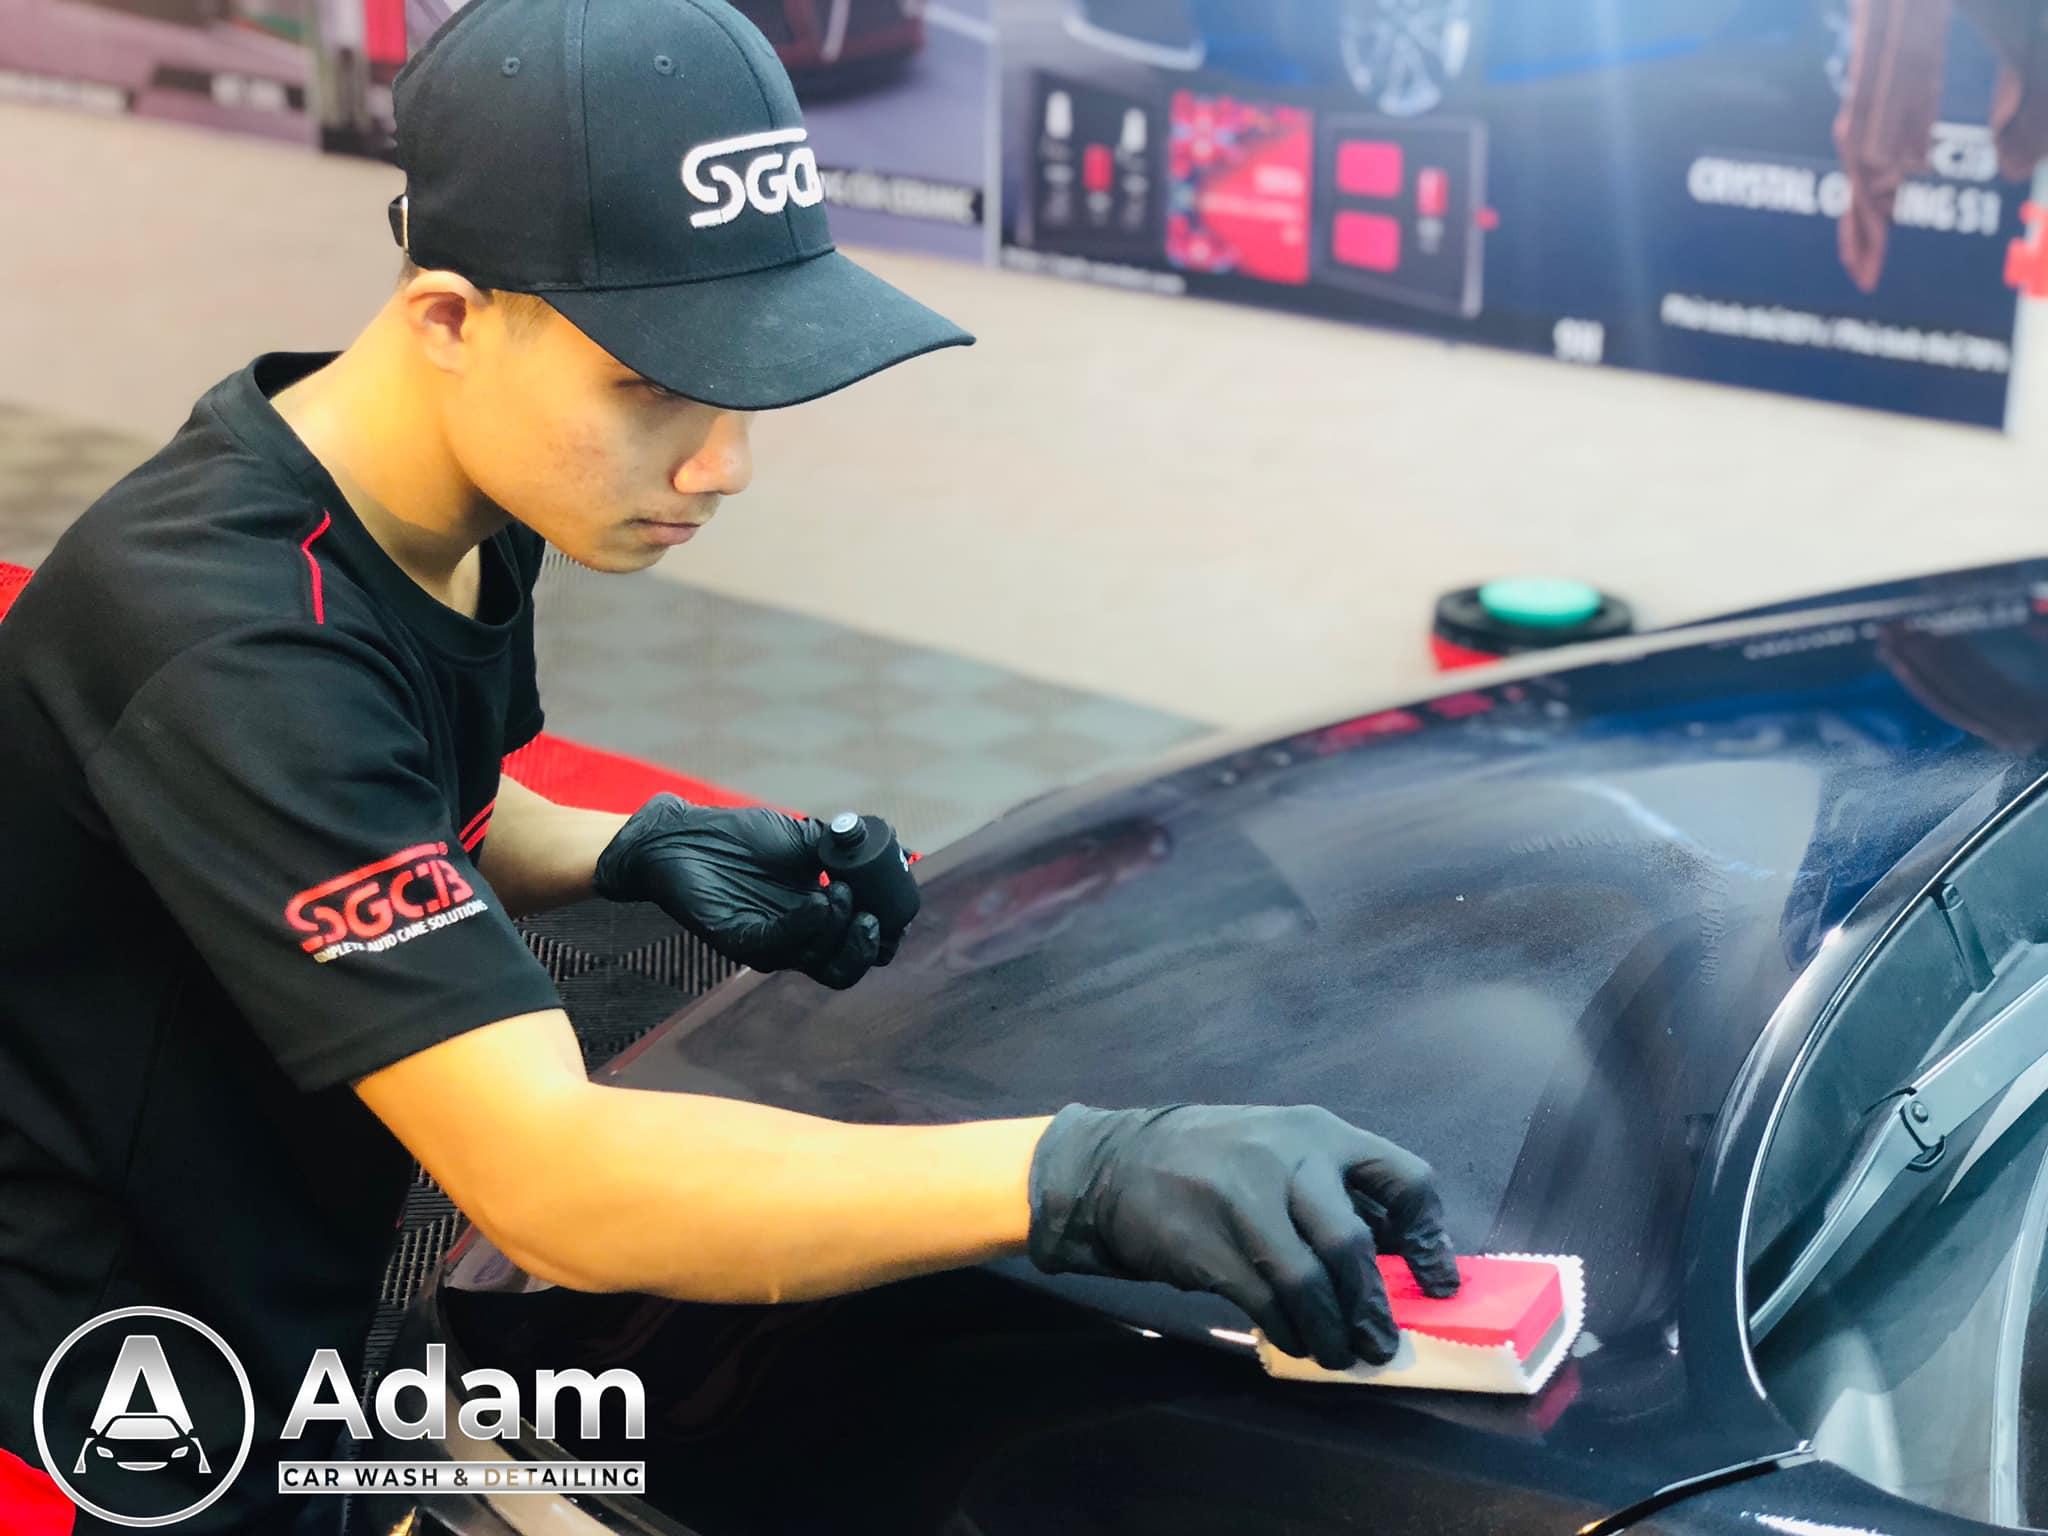 adam-car-wash-detailing-dai-ly-sgcb-khu-vuc-go-vap-6